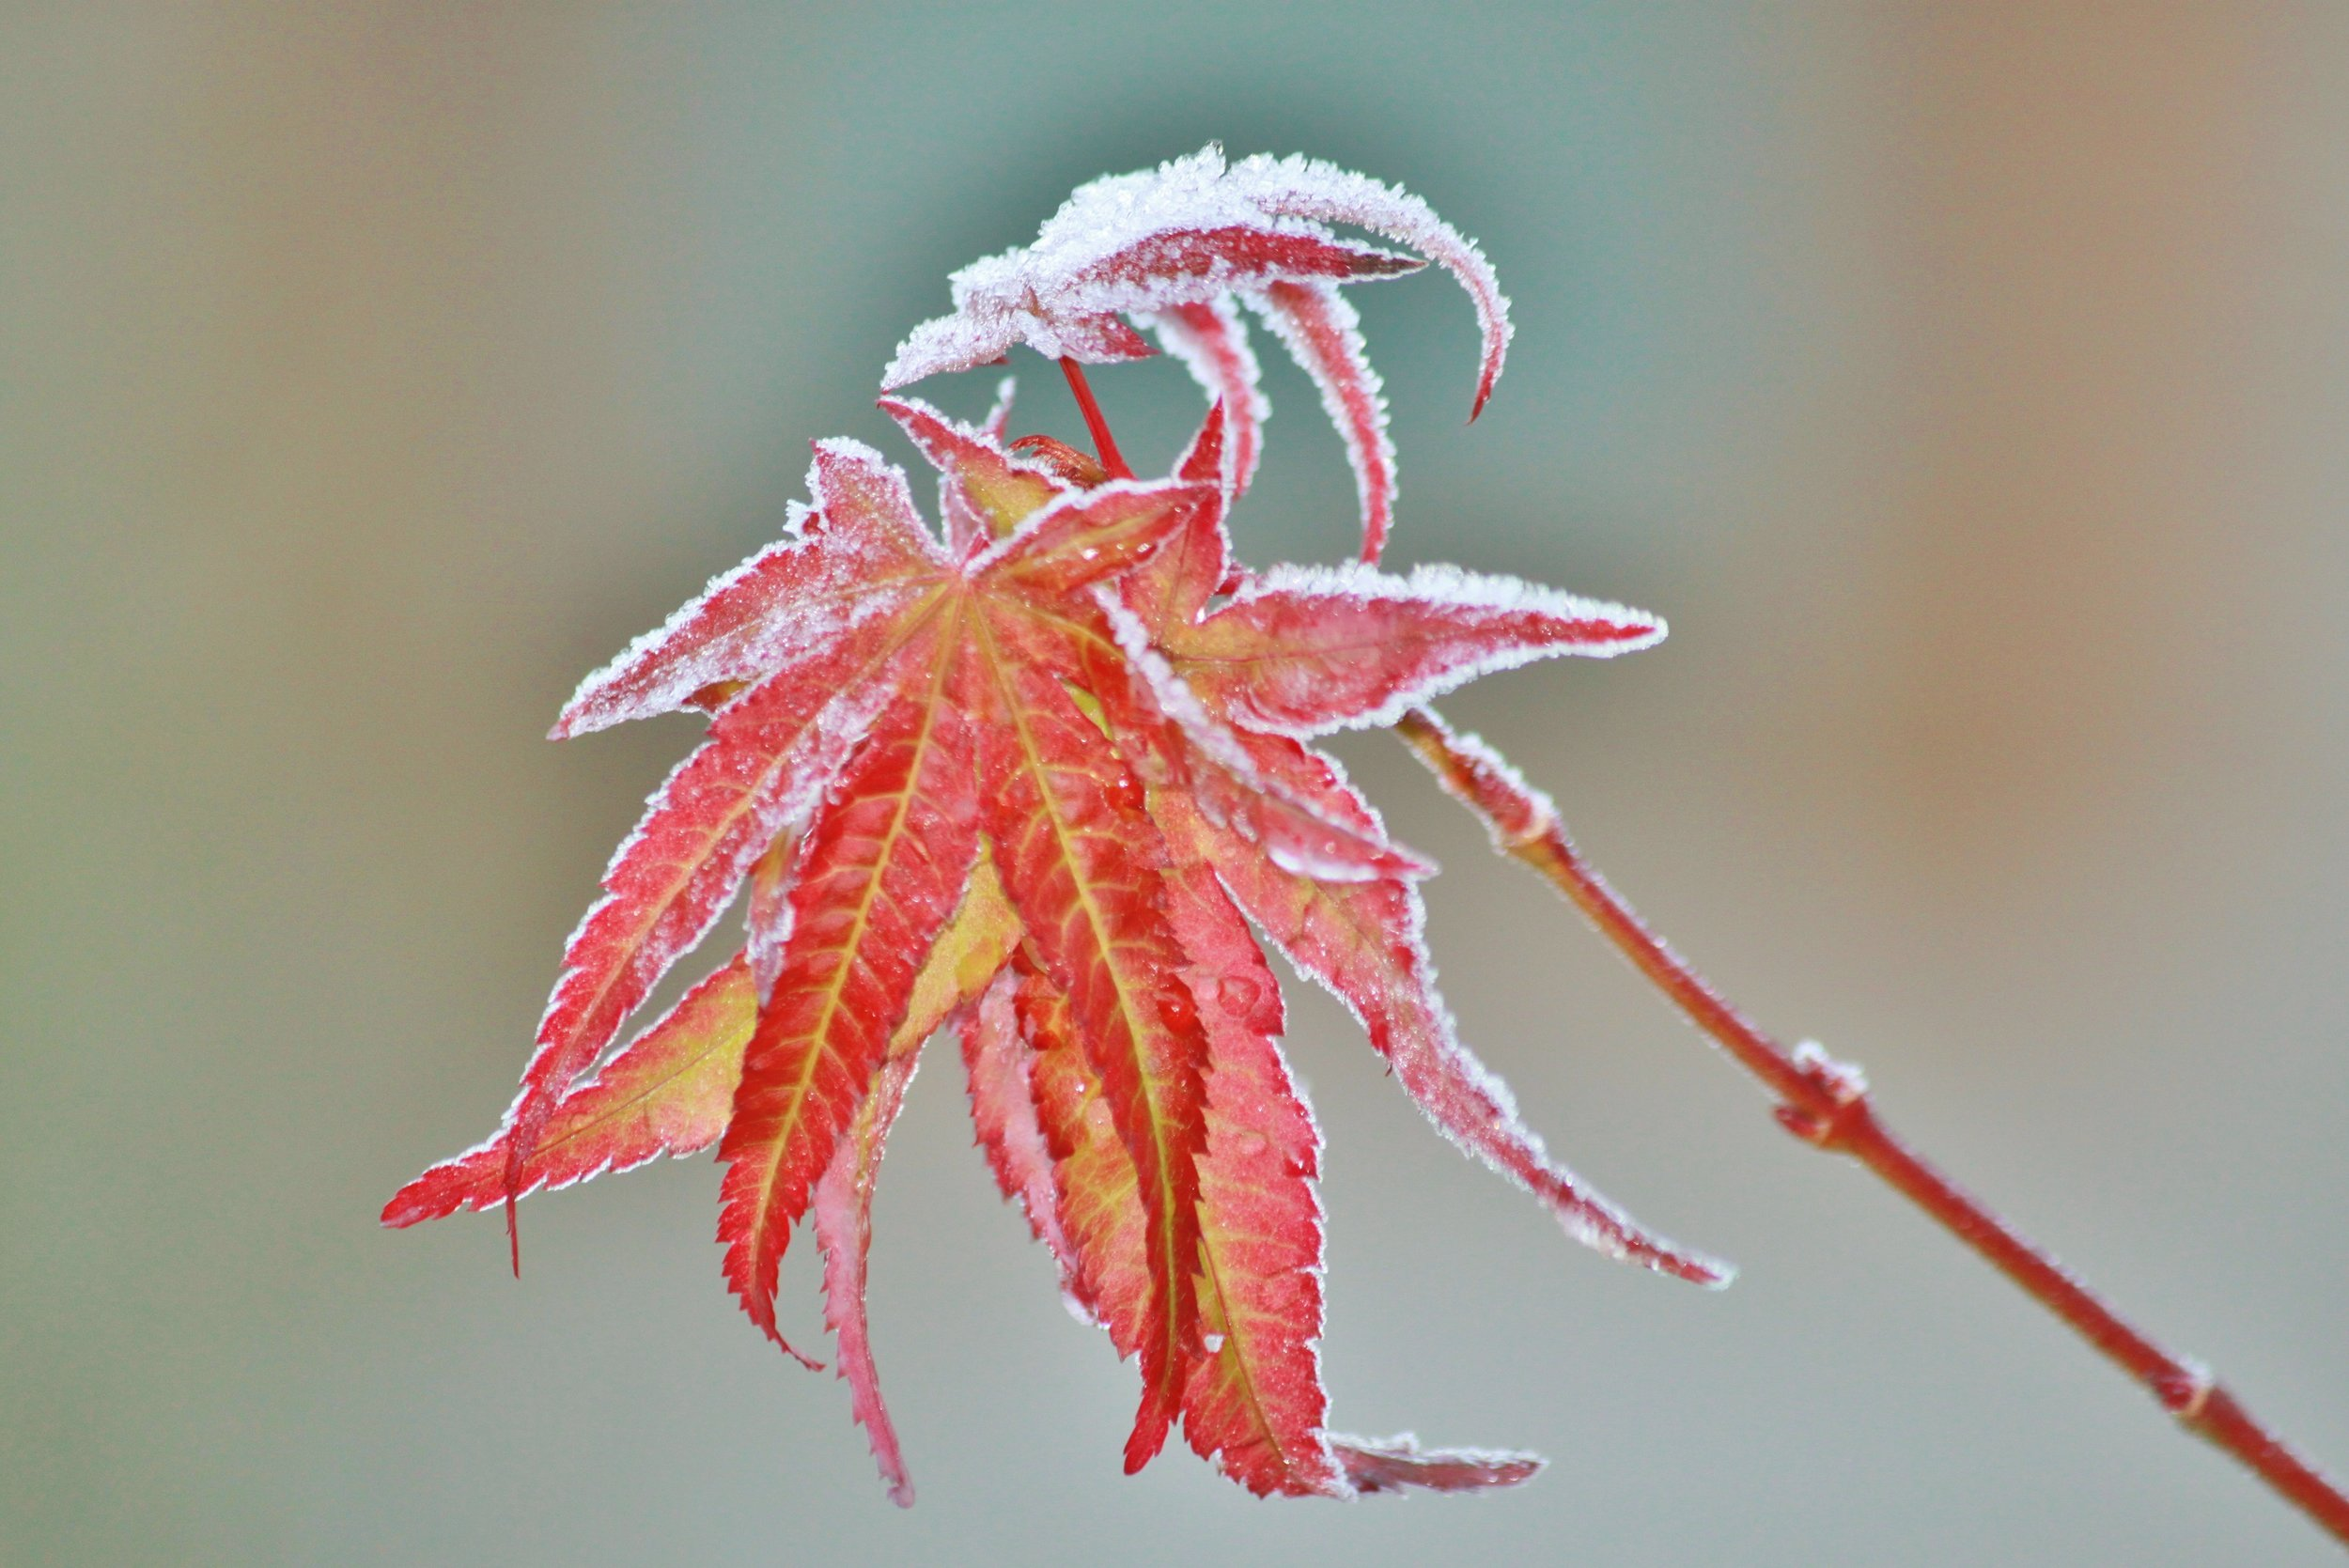 tree-nature-branch-cold-winter-plant-1057232-pxhere.com.jpg